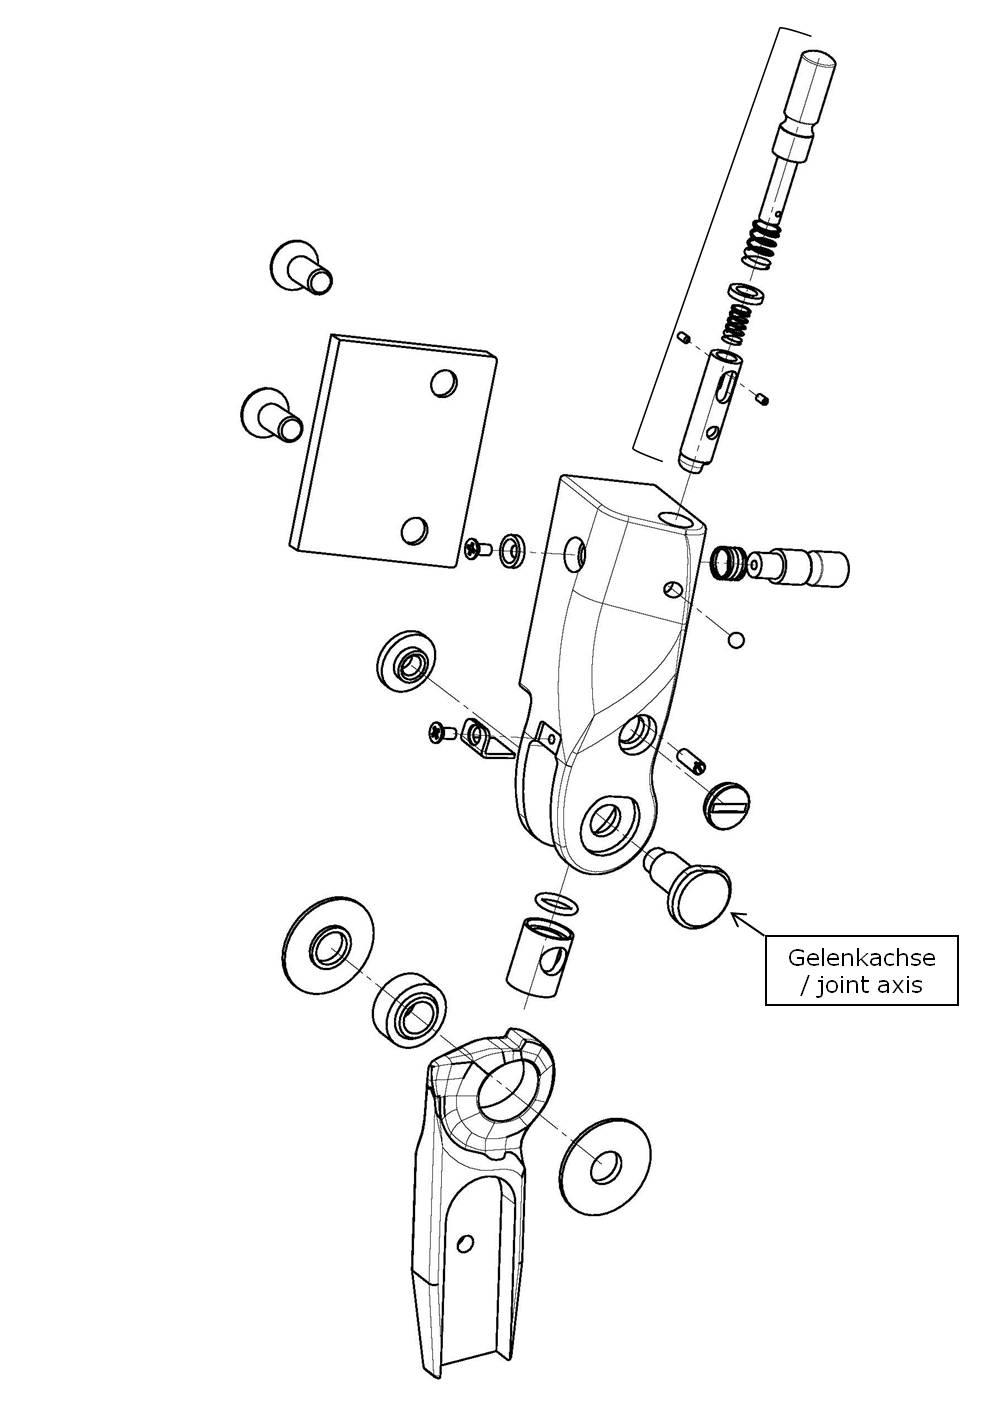 Gelenkachse für das Salera preselect 3-D Hüftgelenk